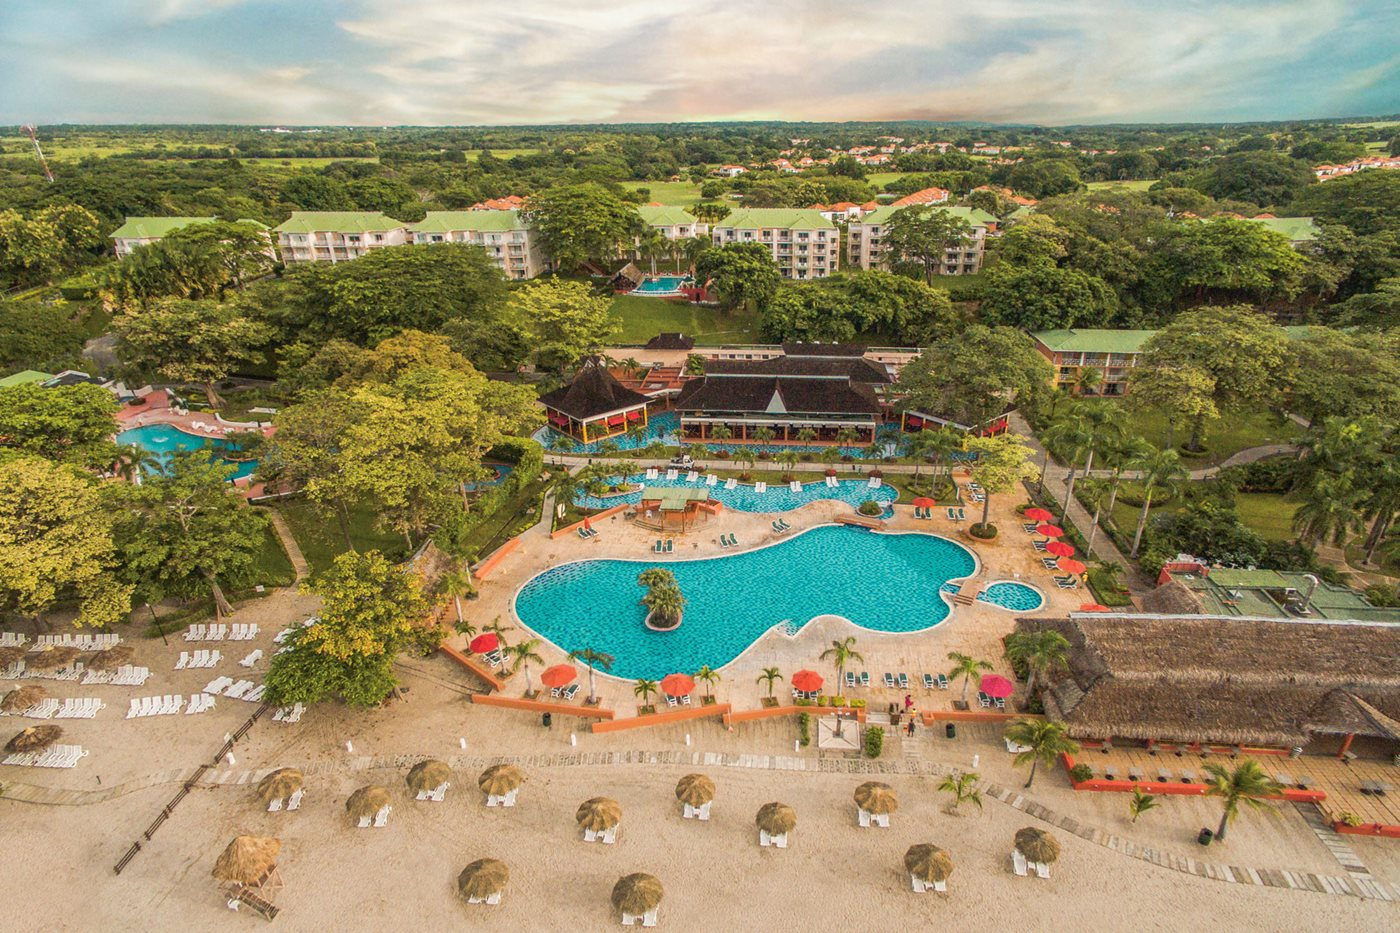 PTY-Royal-Decameron-Golf-Beach-Resort-and-Villas-Aerial-020